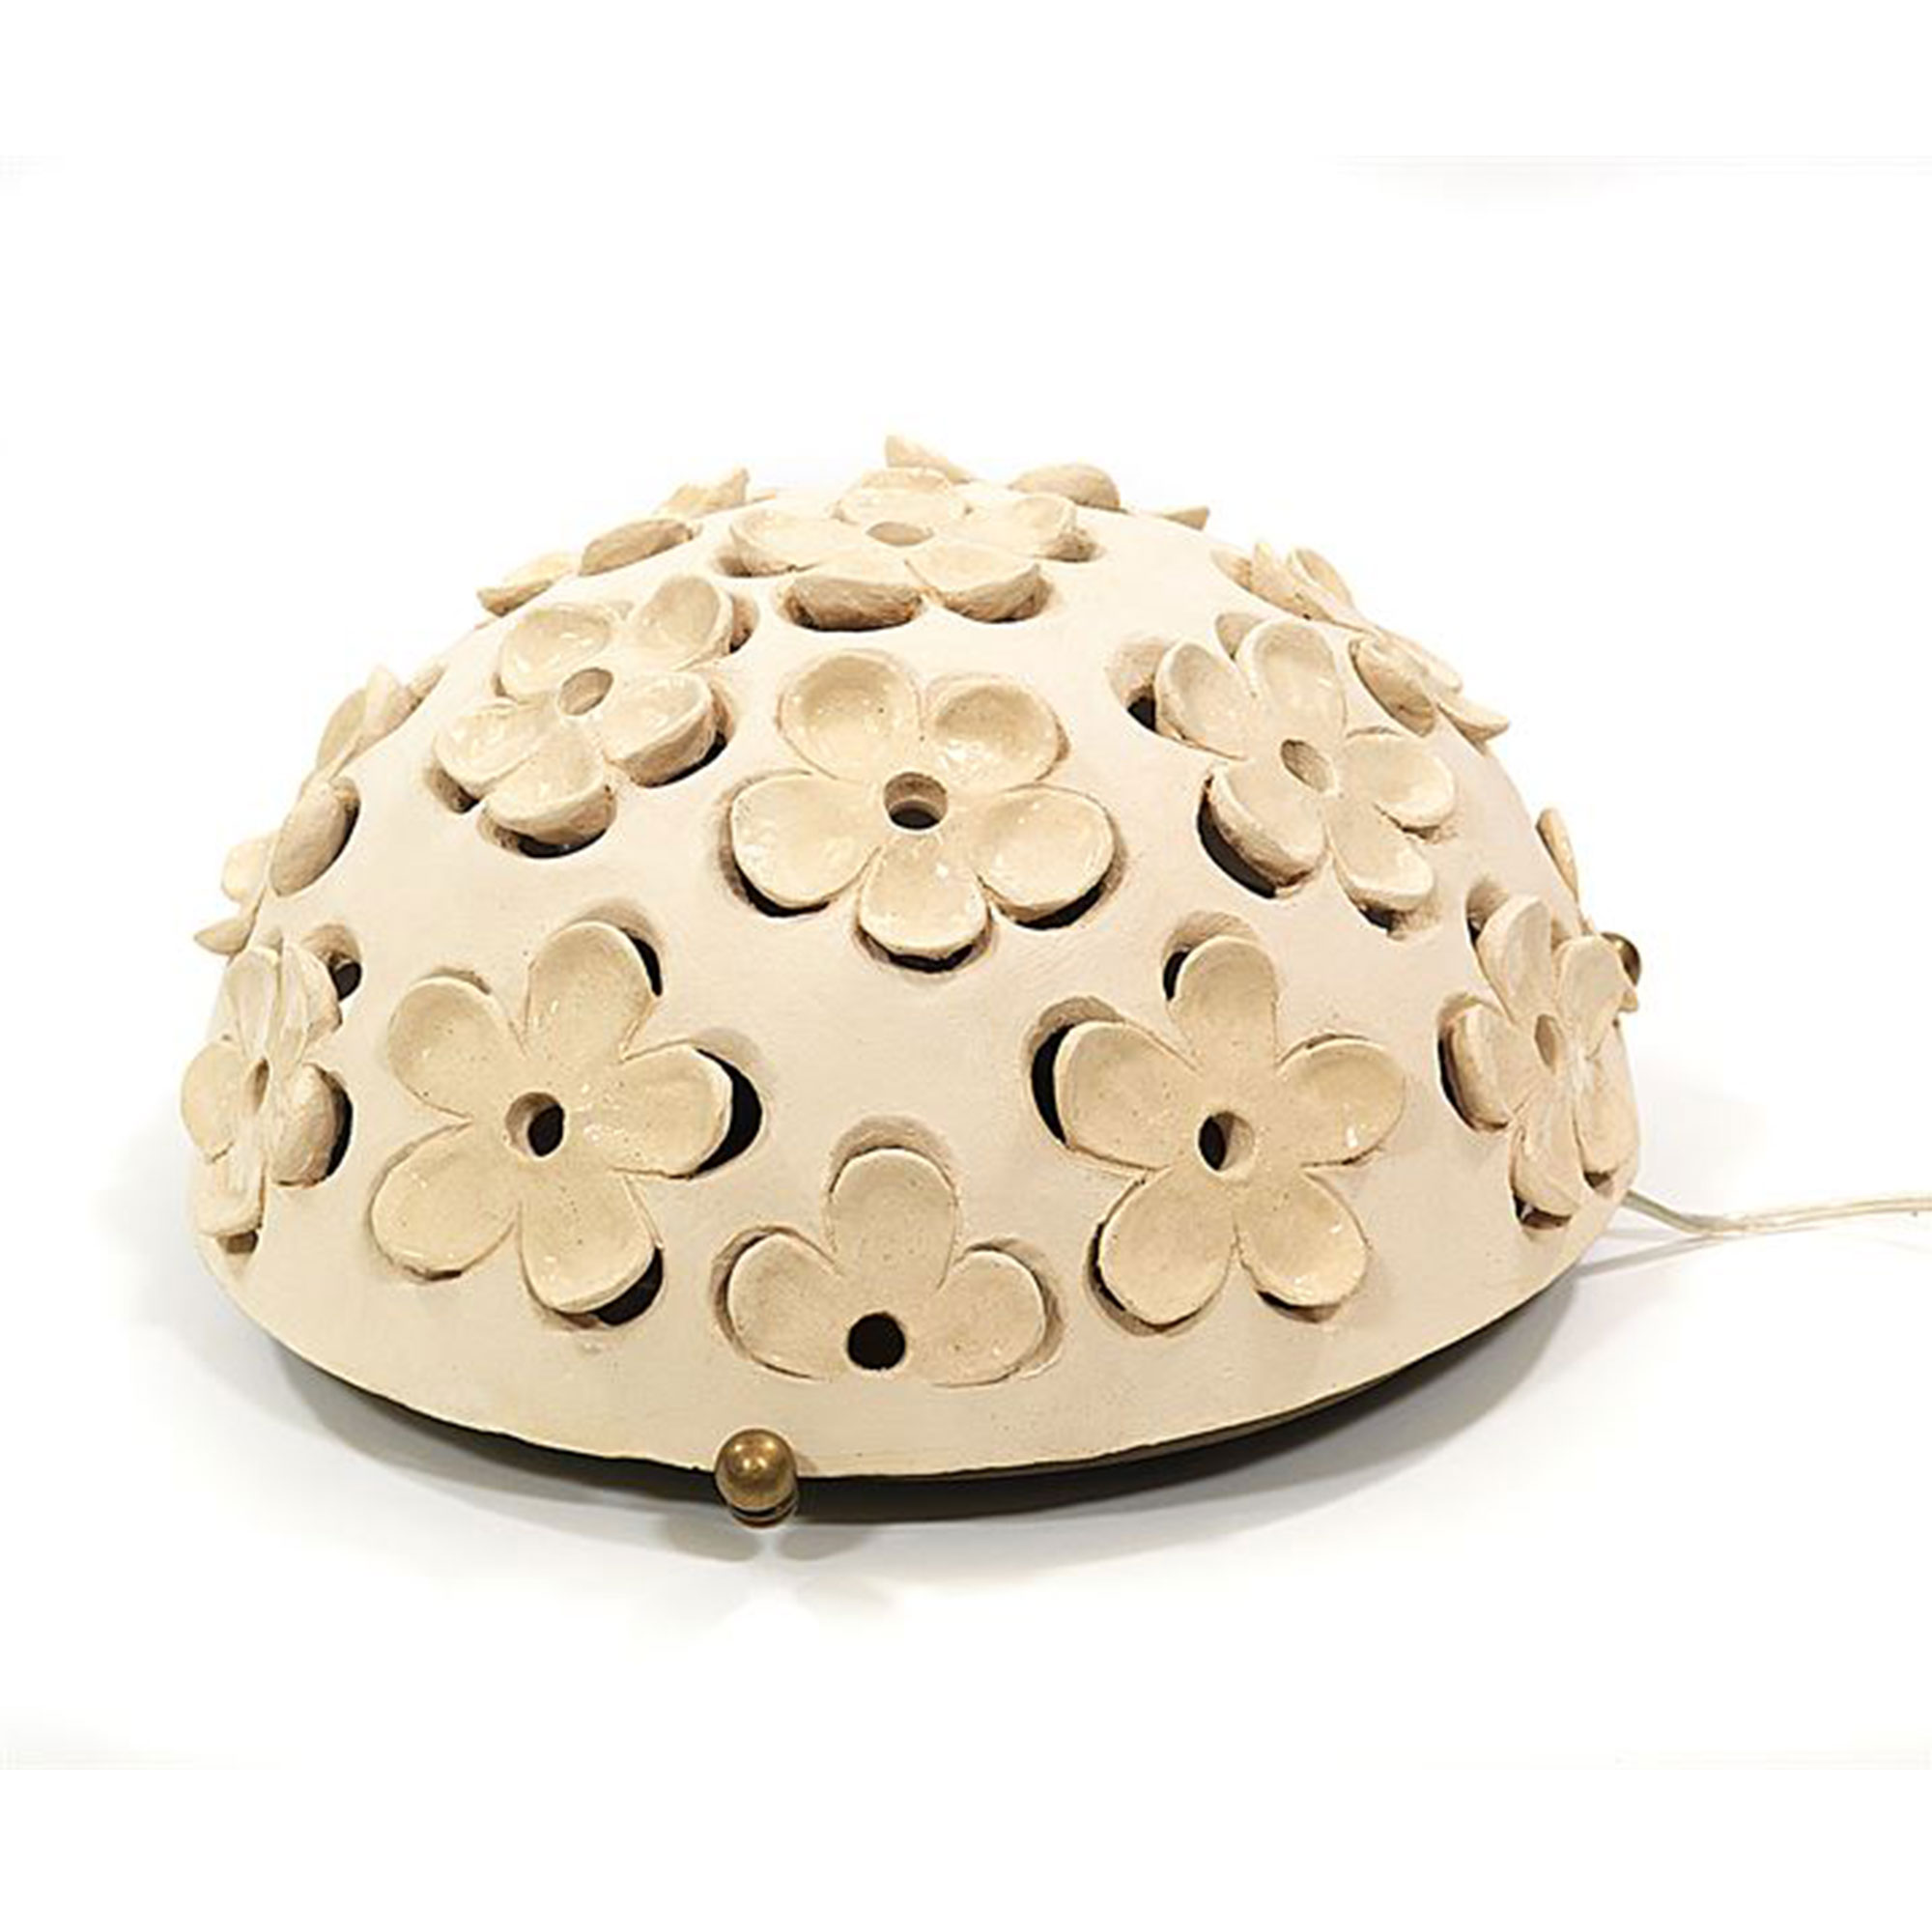 Lampade in ceramica - Stefania Mairano Creazioni in Ceramica